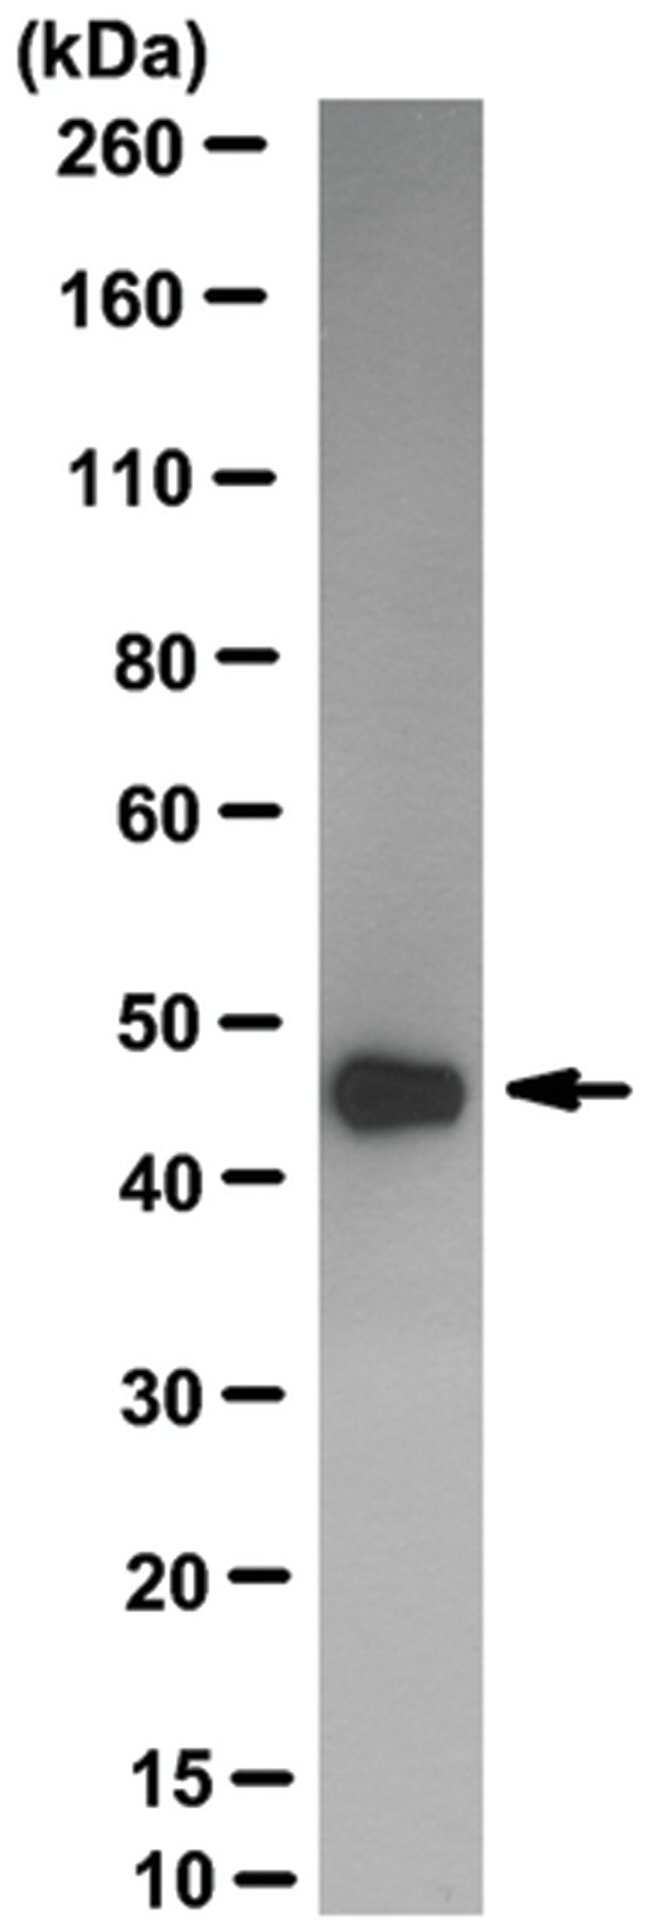 MilliporeSigma ERK1/MAPK3, Rabbit, Unlabeled, Clone: UP-158-22-3-10, 100µL;